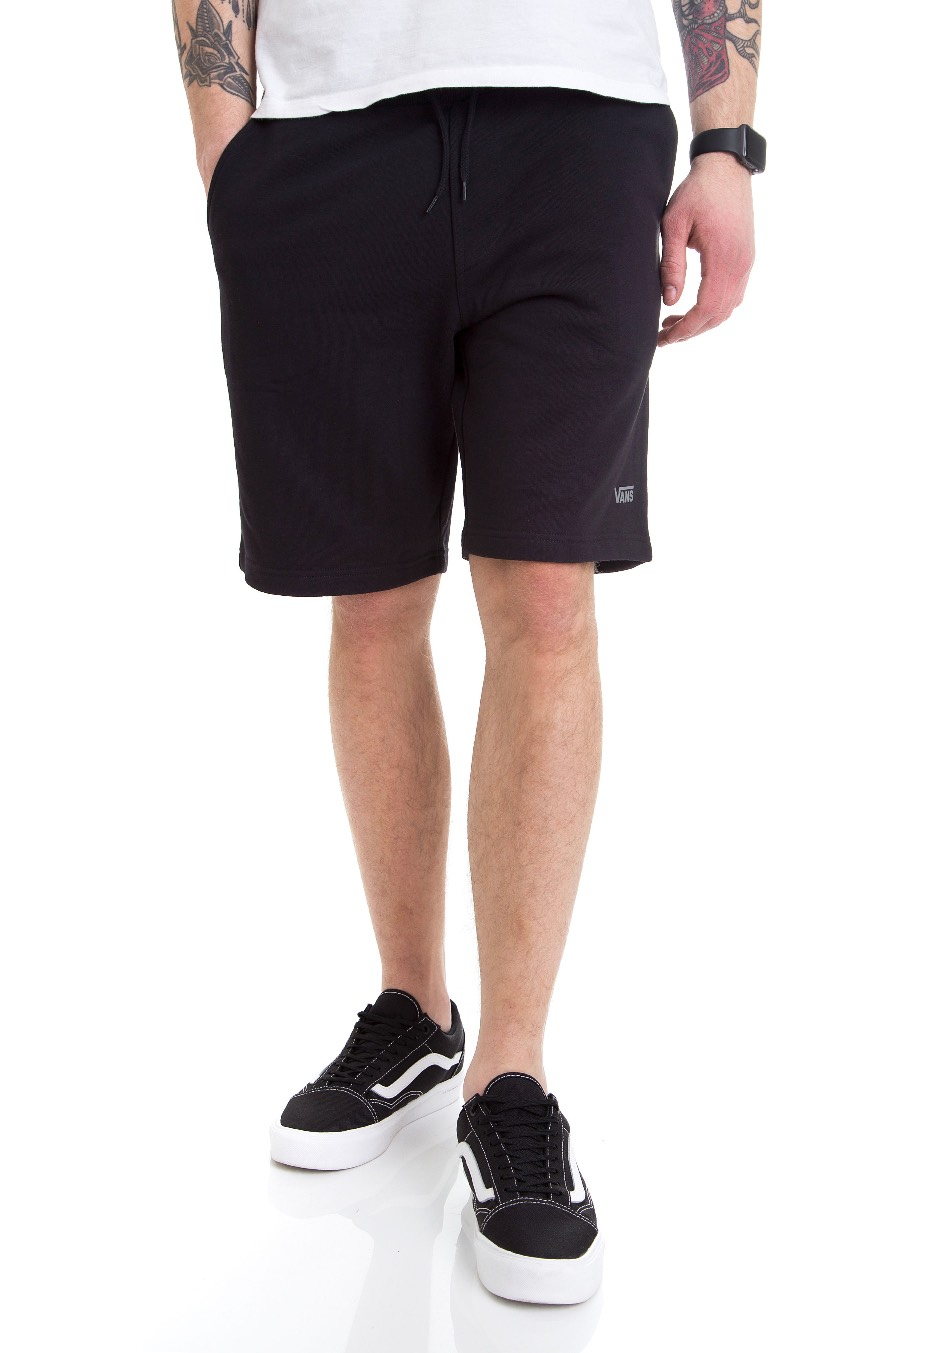 b4fe5417e104b4 Vans - Core Basic Fleece Black - Shorts - Impericon.com US